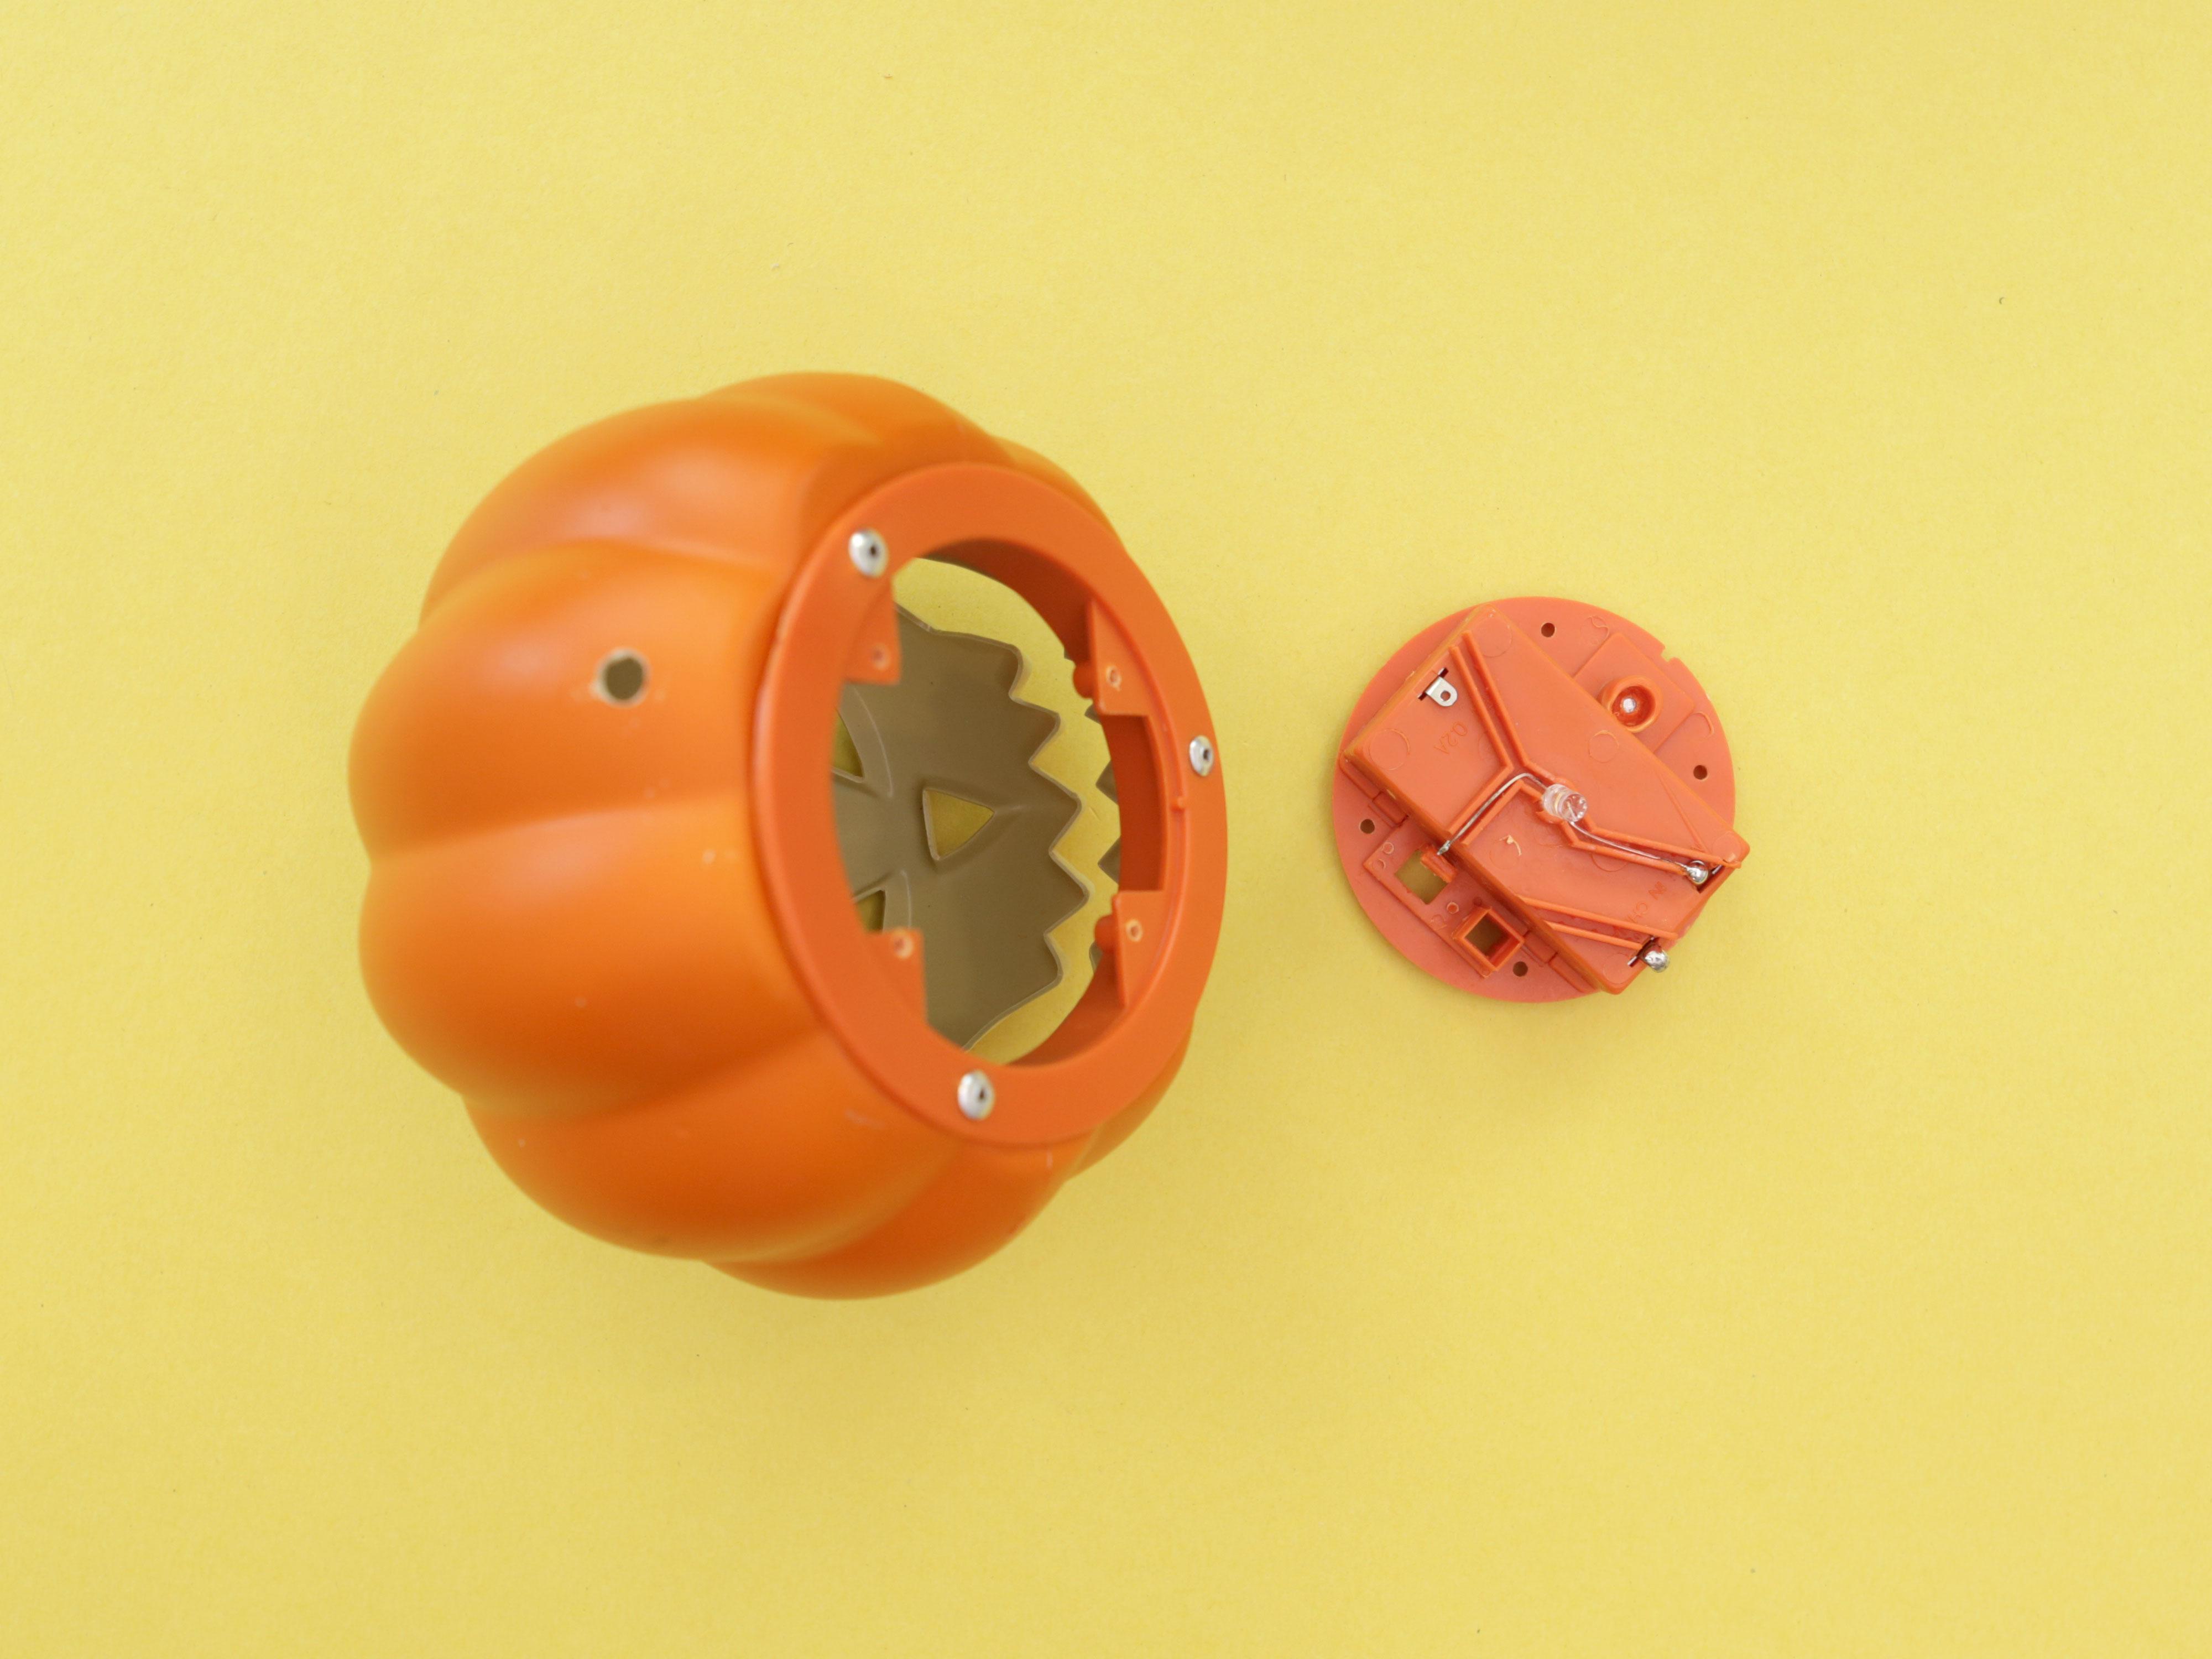 3d_printing_pumpkin-bottom-removed.jpg